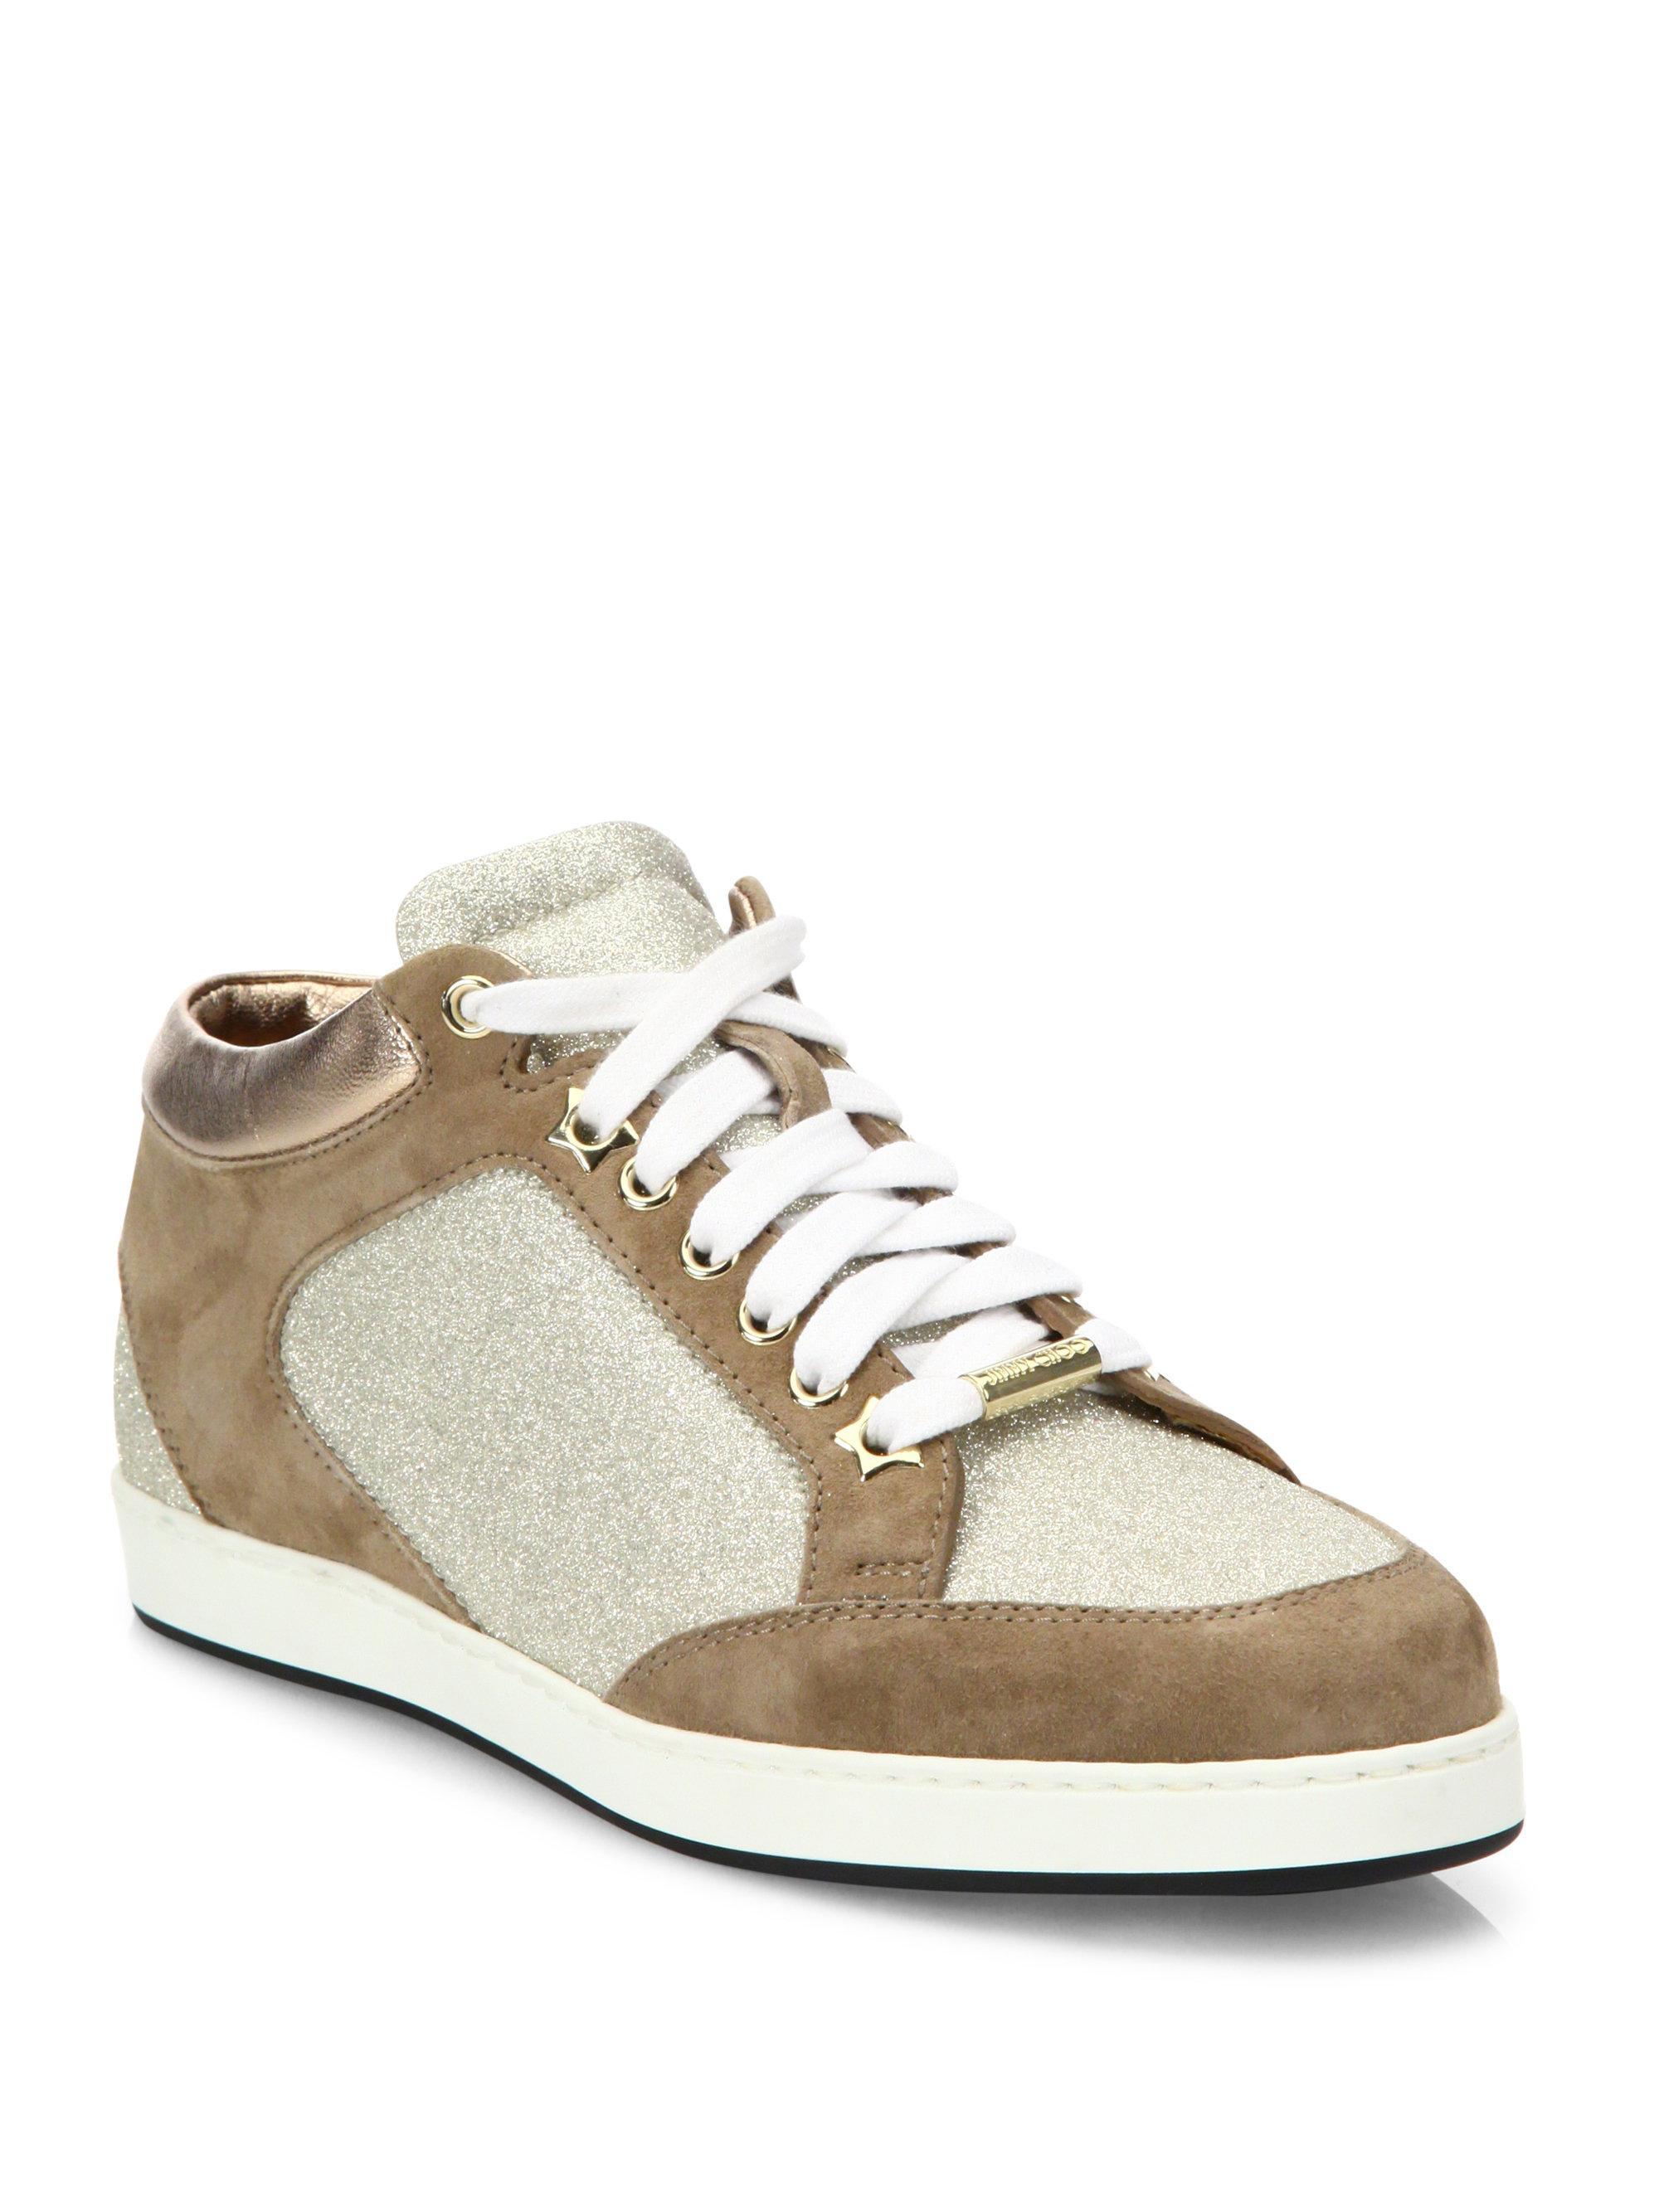 Jimmy choo Sneakers MIAMI suede brown glitter platin 3c6uV